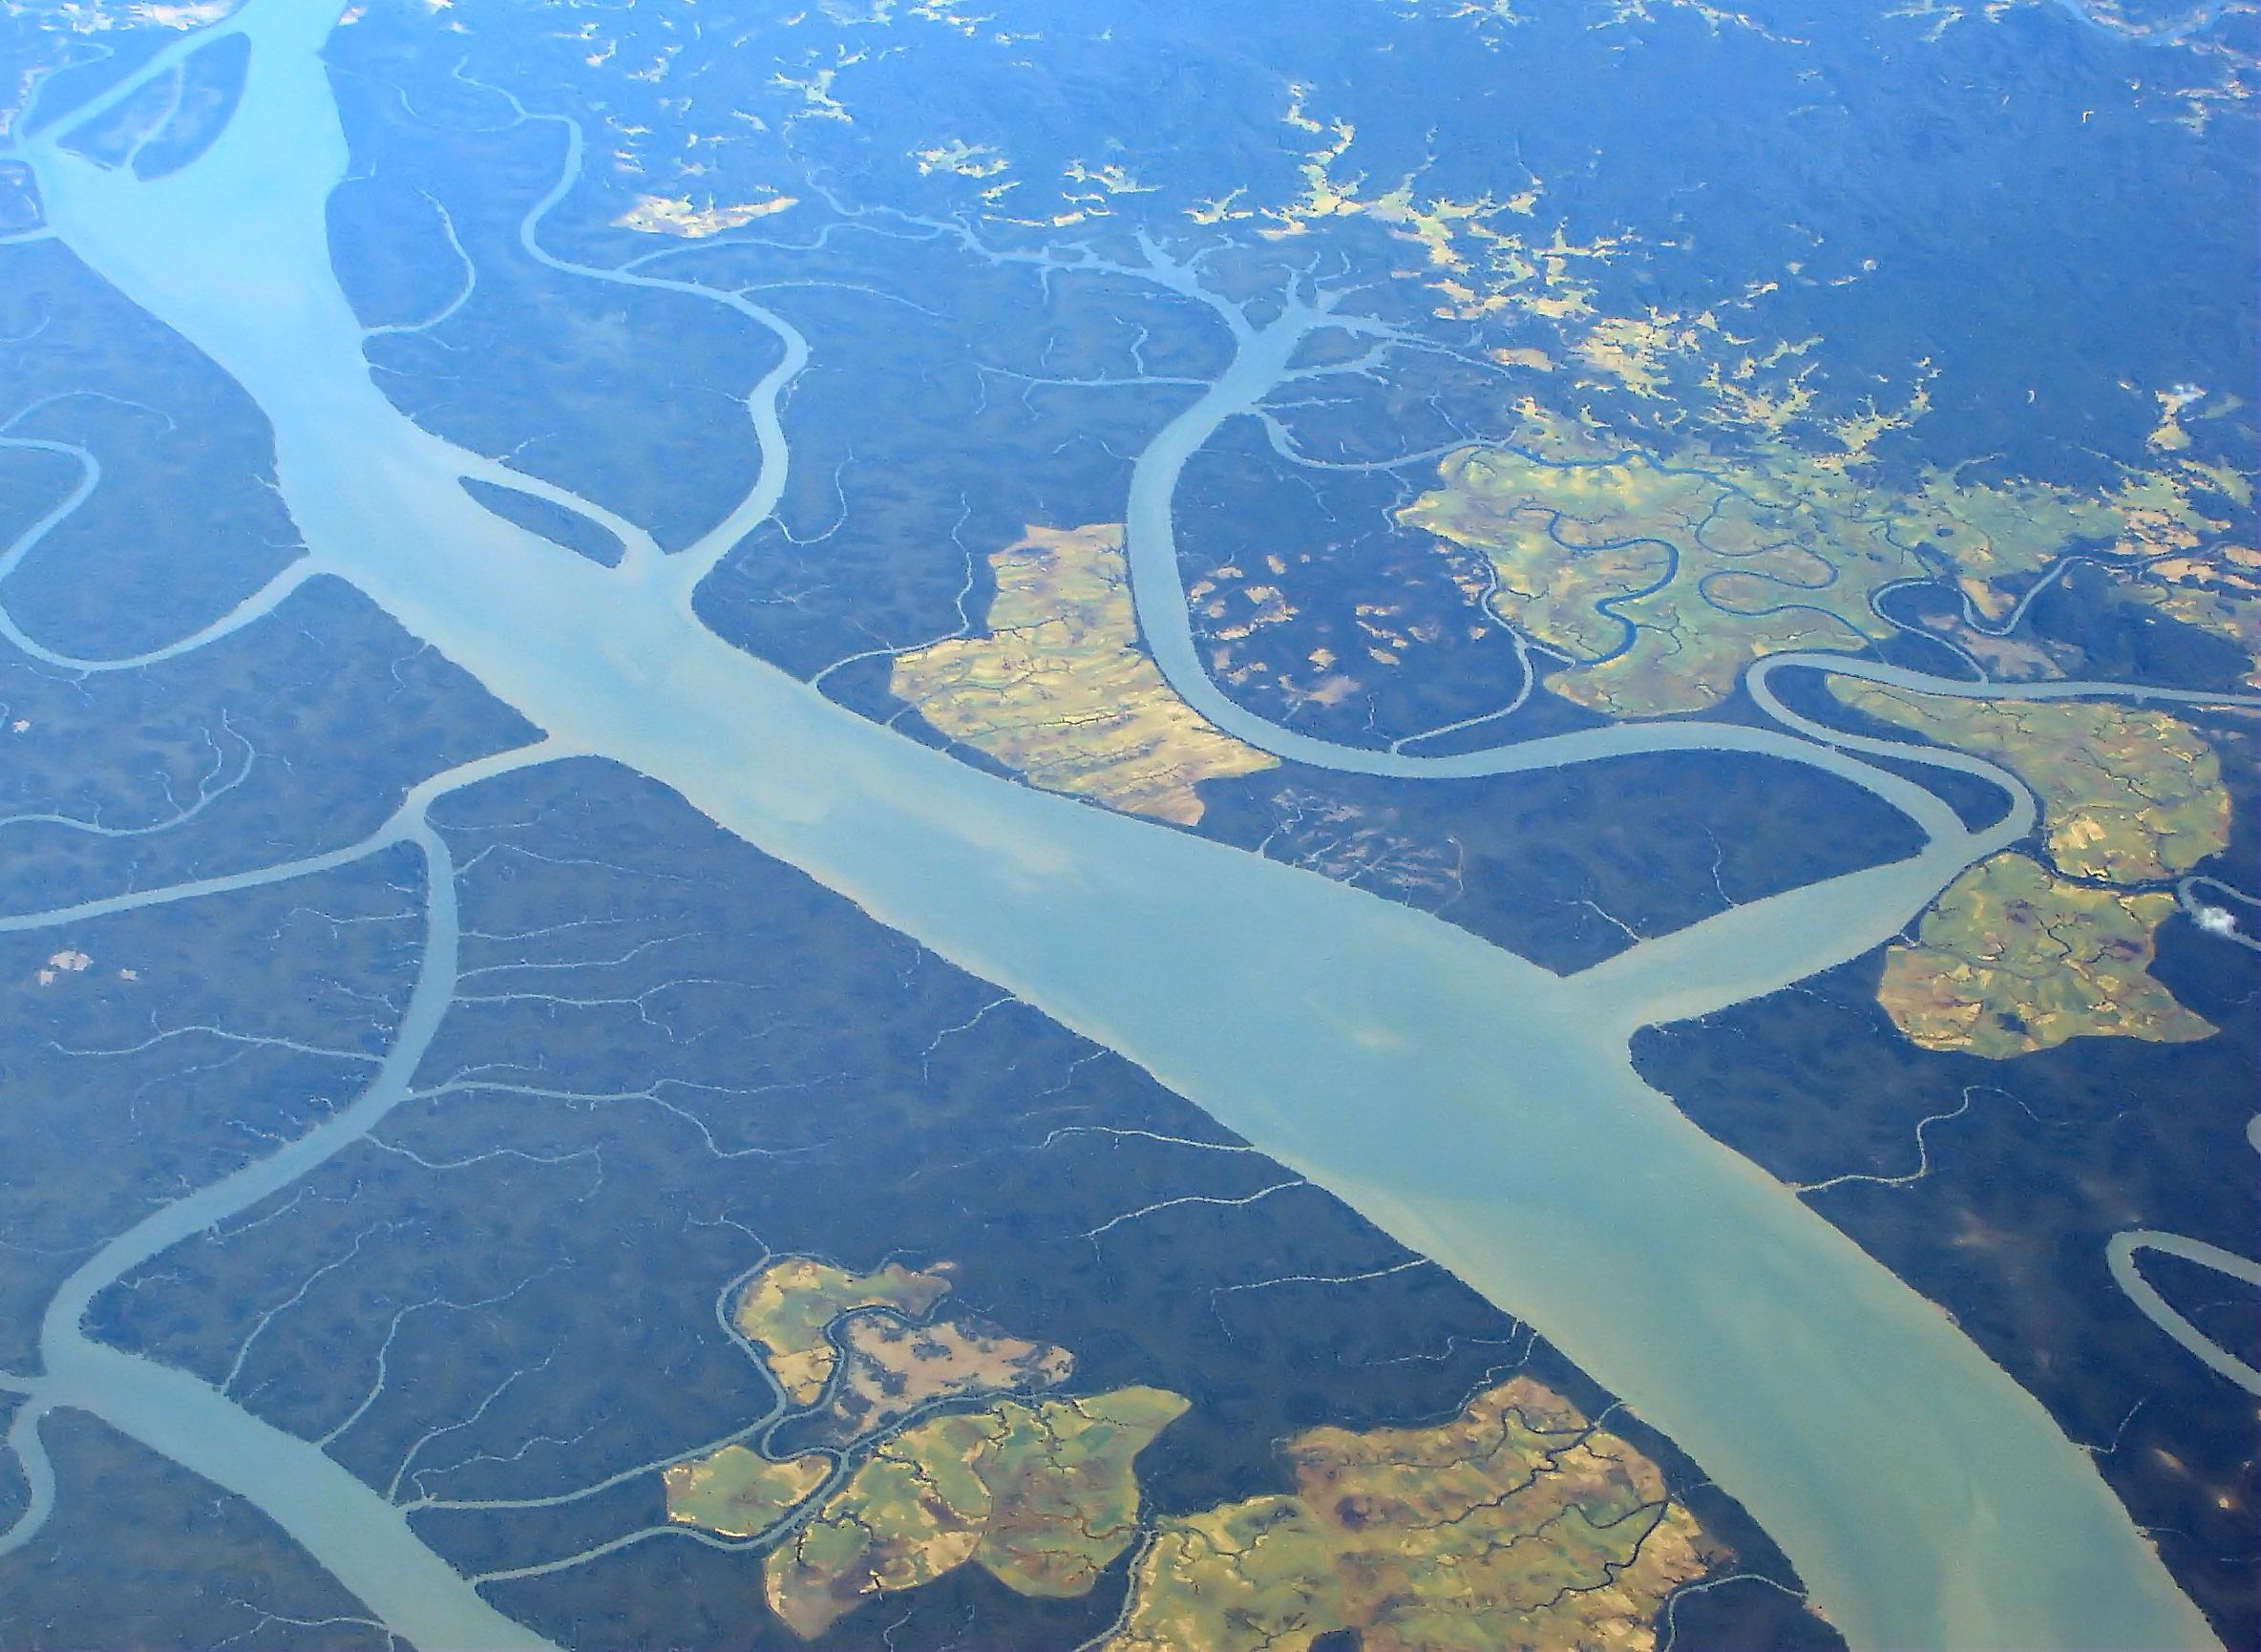 Irrawaddy River - Wikipedia on shwedagon paya, salween river map, andaman sea, amazon river map, ob river, yellow river map, mandalay palace, indus river map, amu darya, inle lake, west river map, chang river map, rhine river map, salween river, yangtze river, red river on map, mali river, amur river map, euphrates river map, kachin state, irrawaddy delta, hong river map, lancang river map, yellow river, mississippi river map, rakhine state, rhone river map, kuthodaw pagoda, vistula river map, ananda temple, niger river map, ob river map, tigris river map, yenisei river, irrawaddy dolphin, chindwin river, brahmaputra river map,